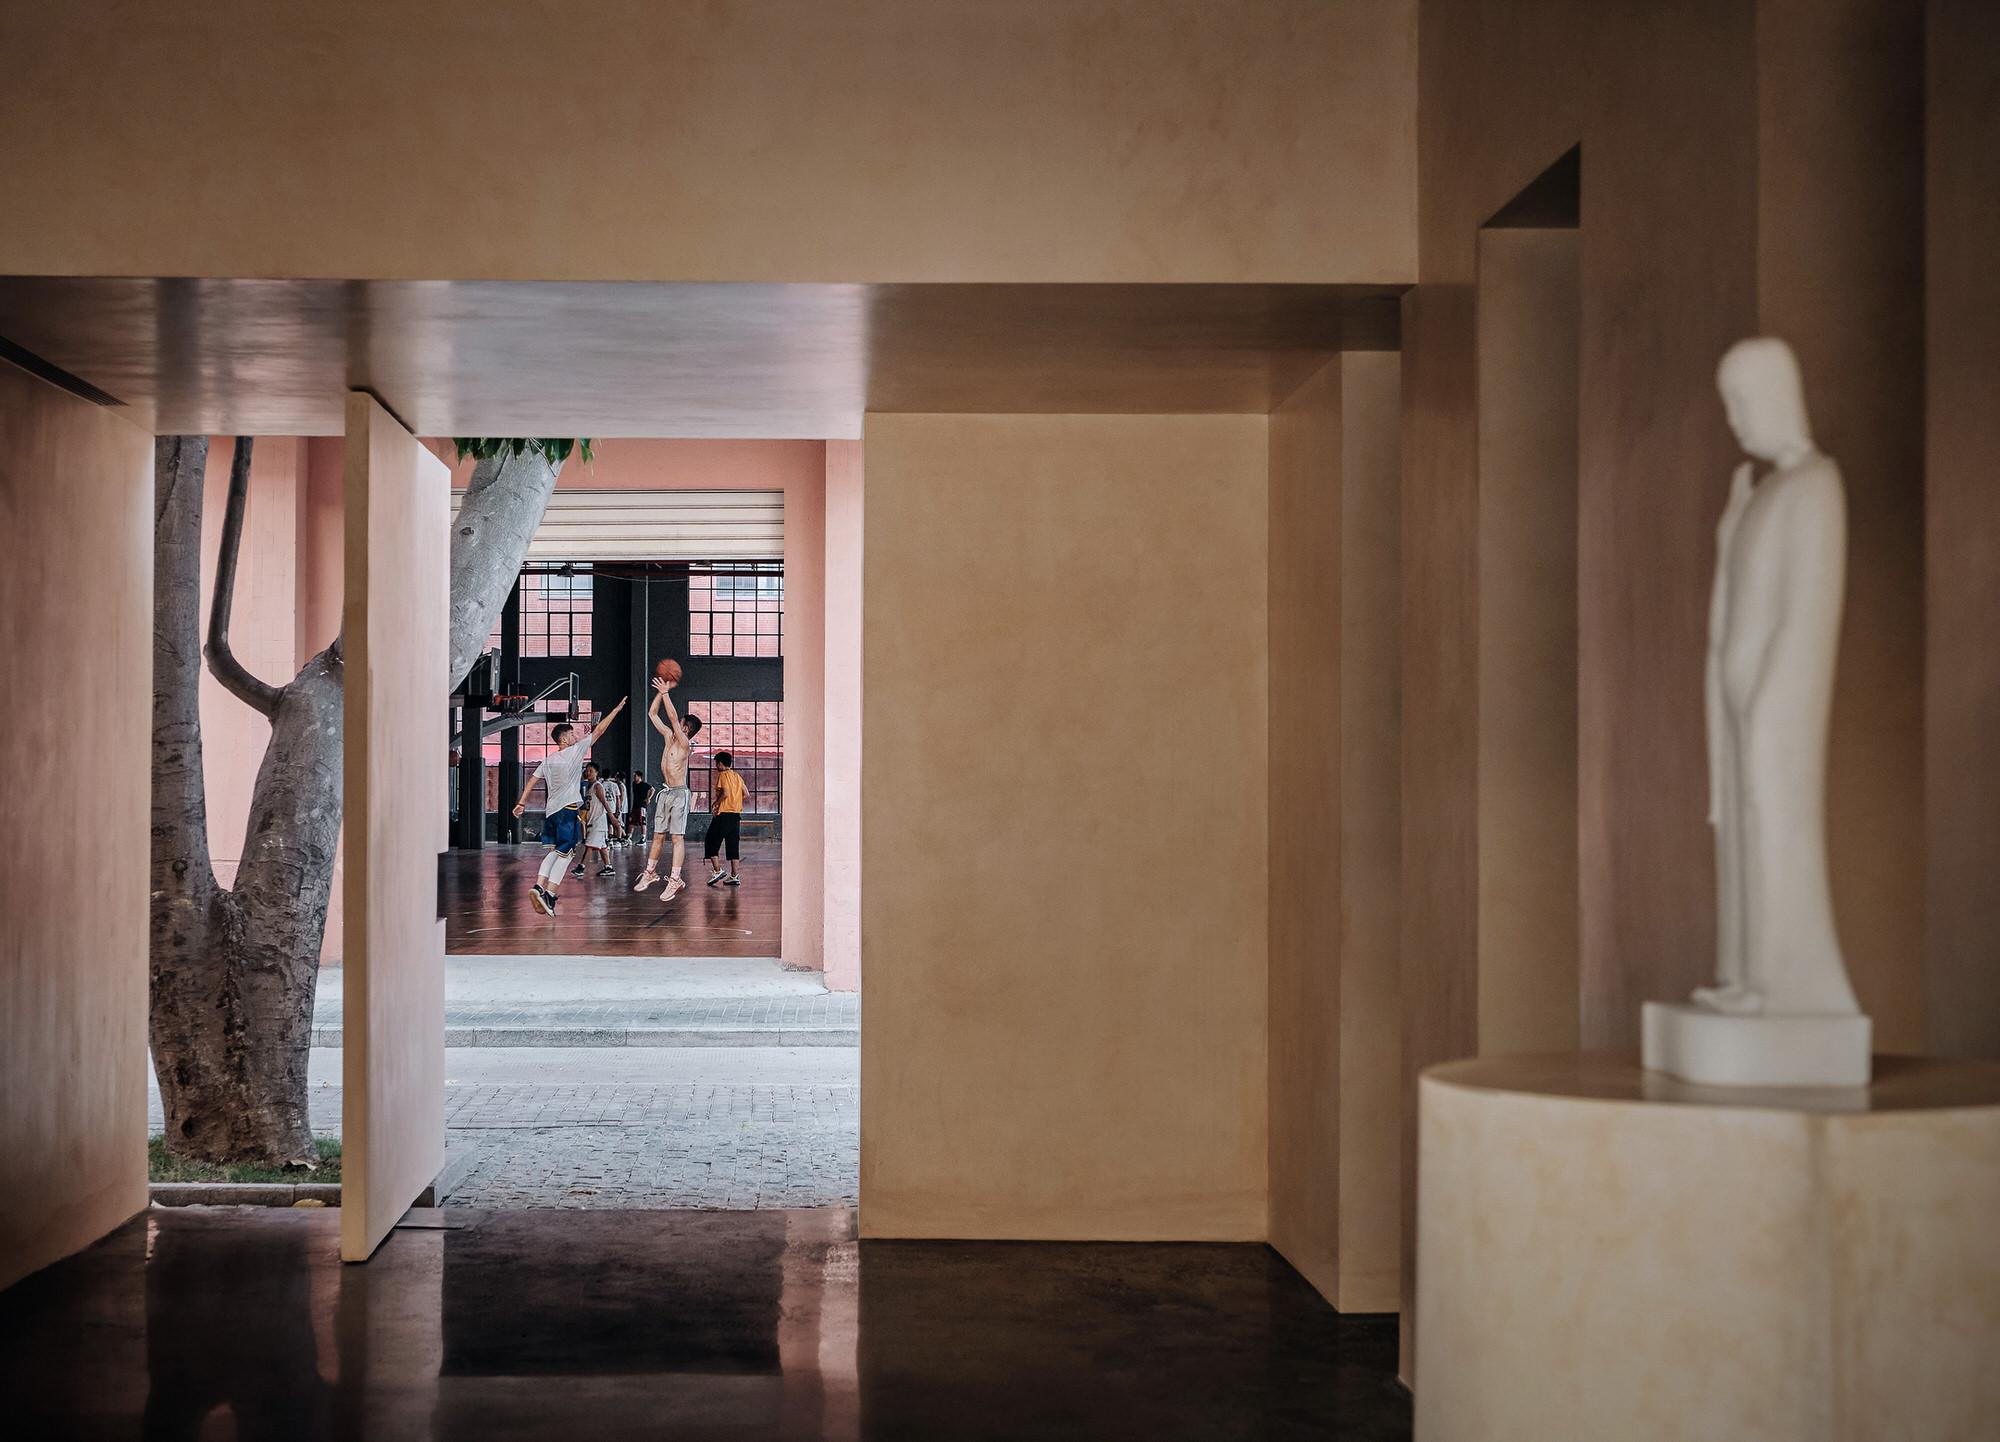 Team Bldg The Field Studio Exhibition Space For Buddha Artist Photo Jonathan Leijonhufvud Yellowtrace 21